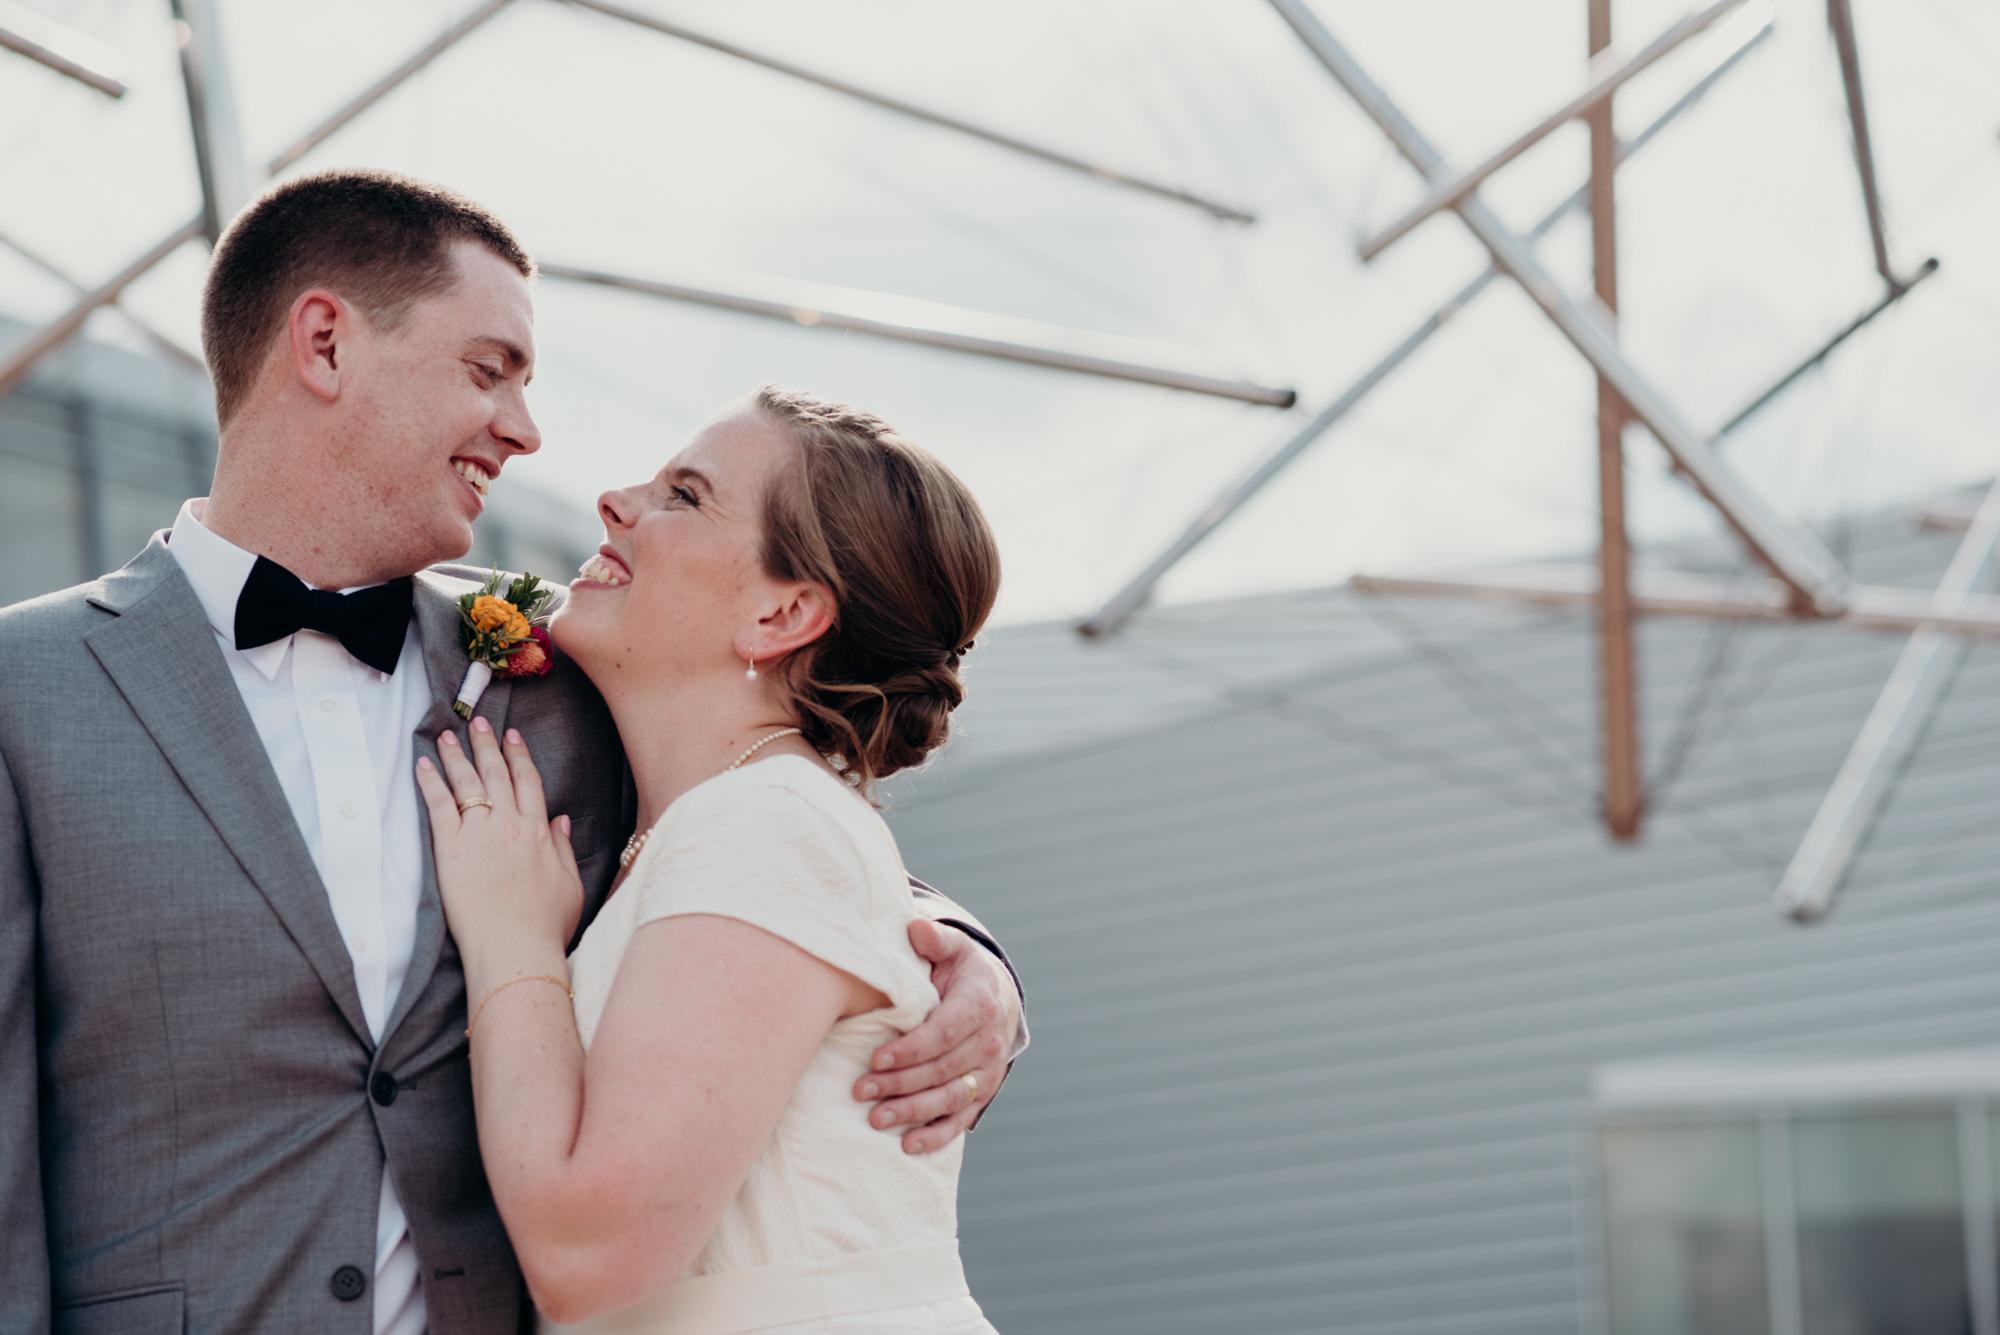 catholic-social-teaching-wedding-22.jpg